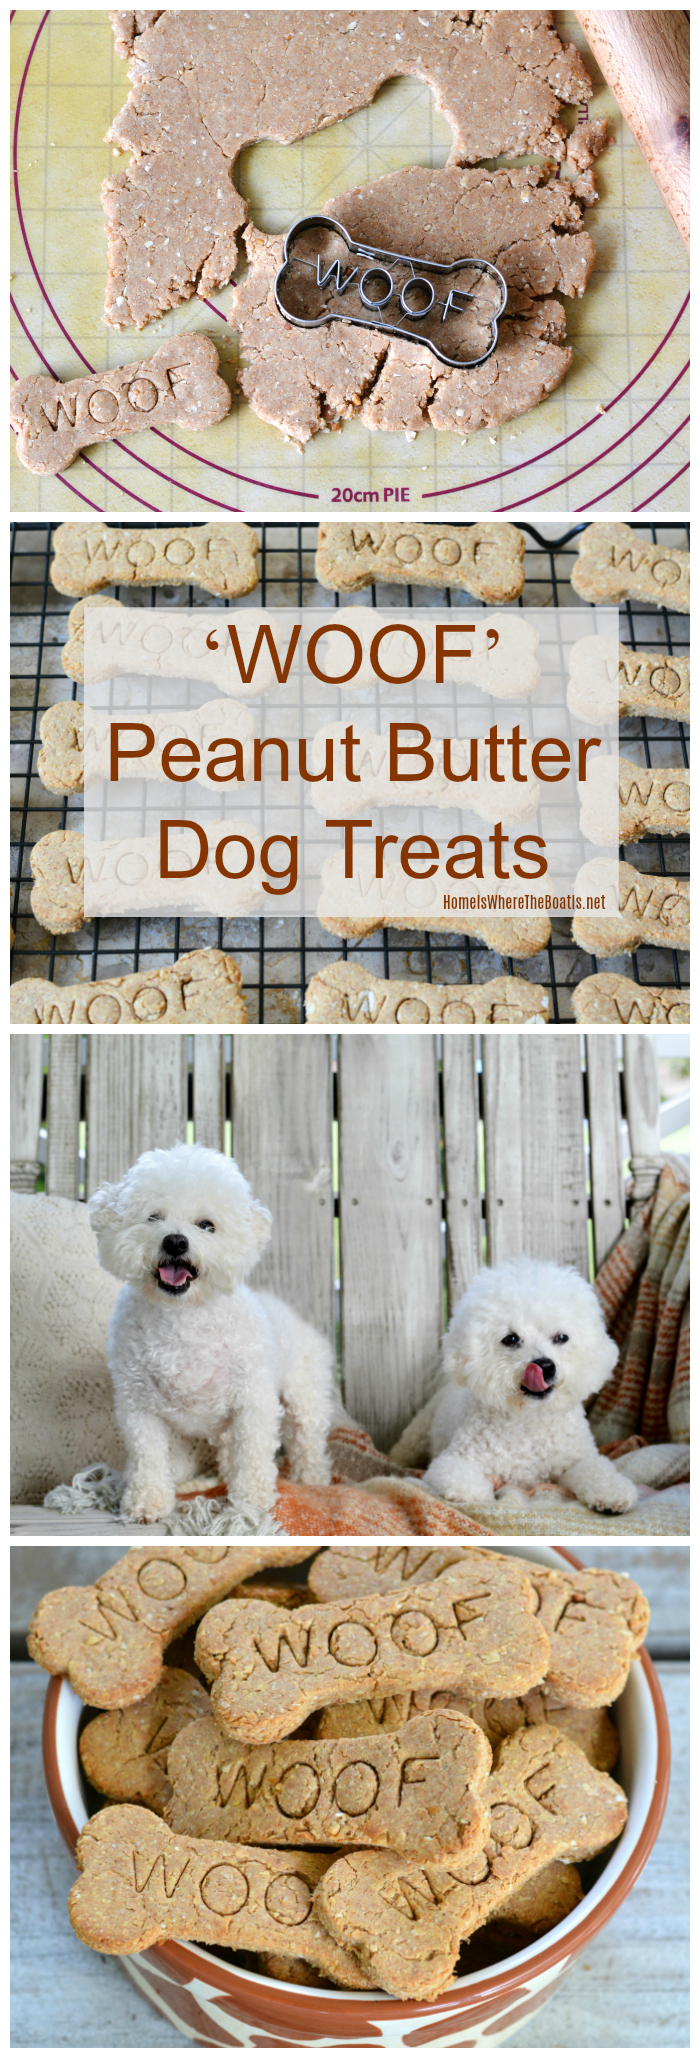 WOOF Homemade Peanut Butter Dog Treats Recipe | homeiswheretheboatis.net #NationalDogDay #BichonFrise #dogtreats #recipe #dogs